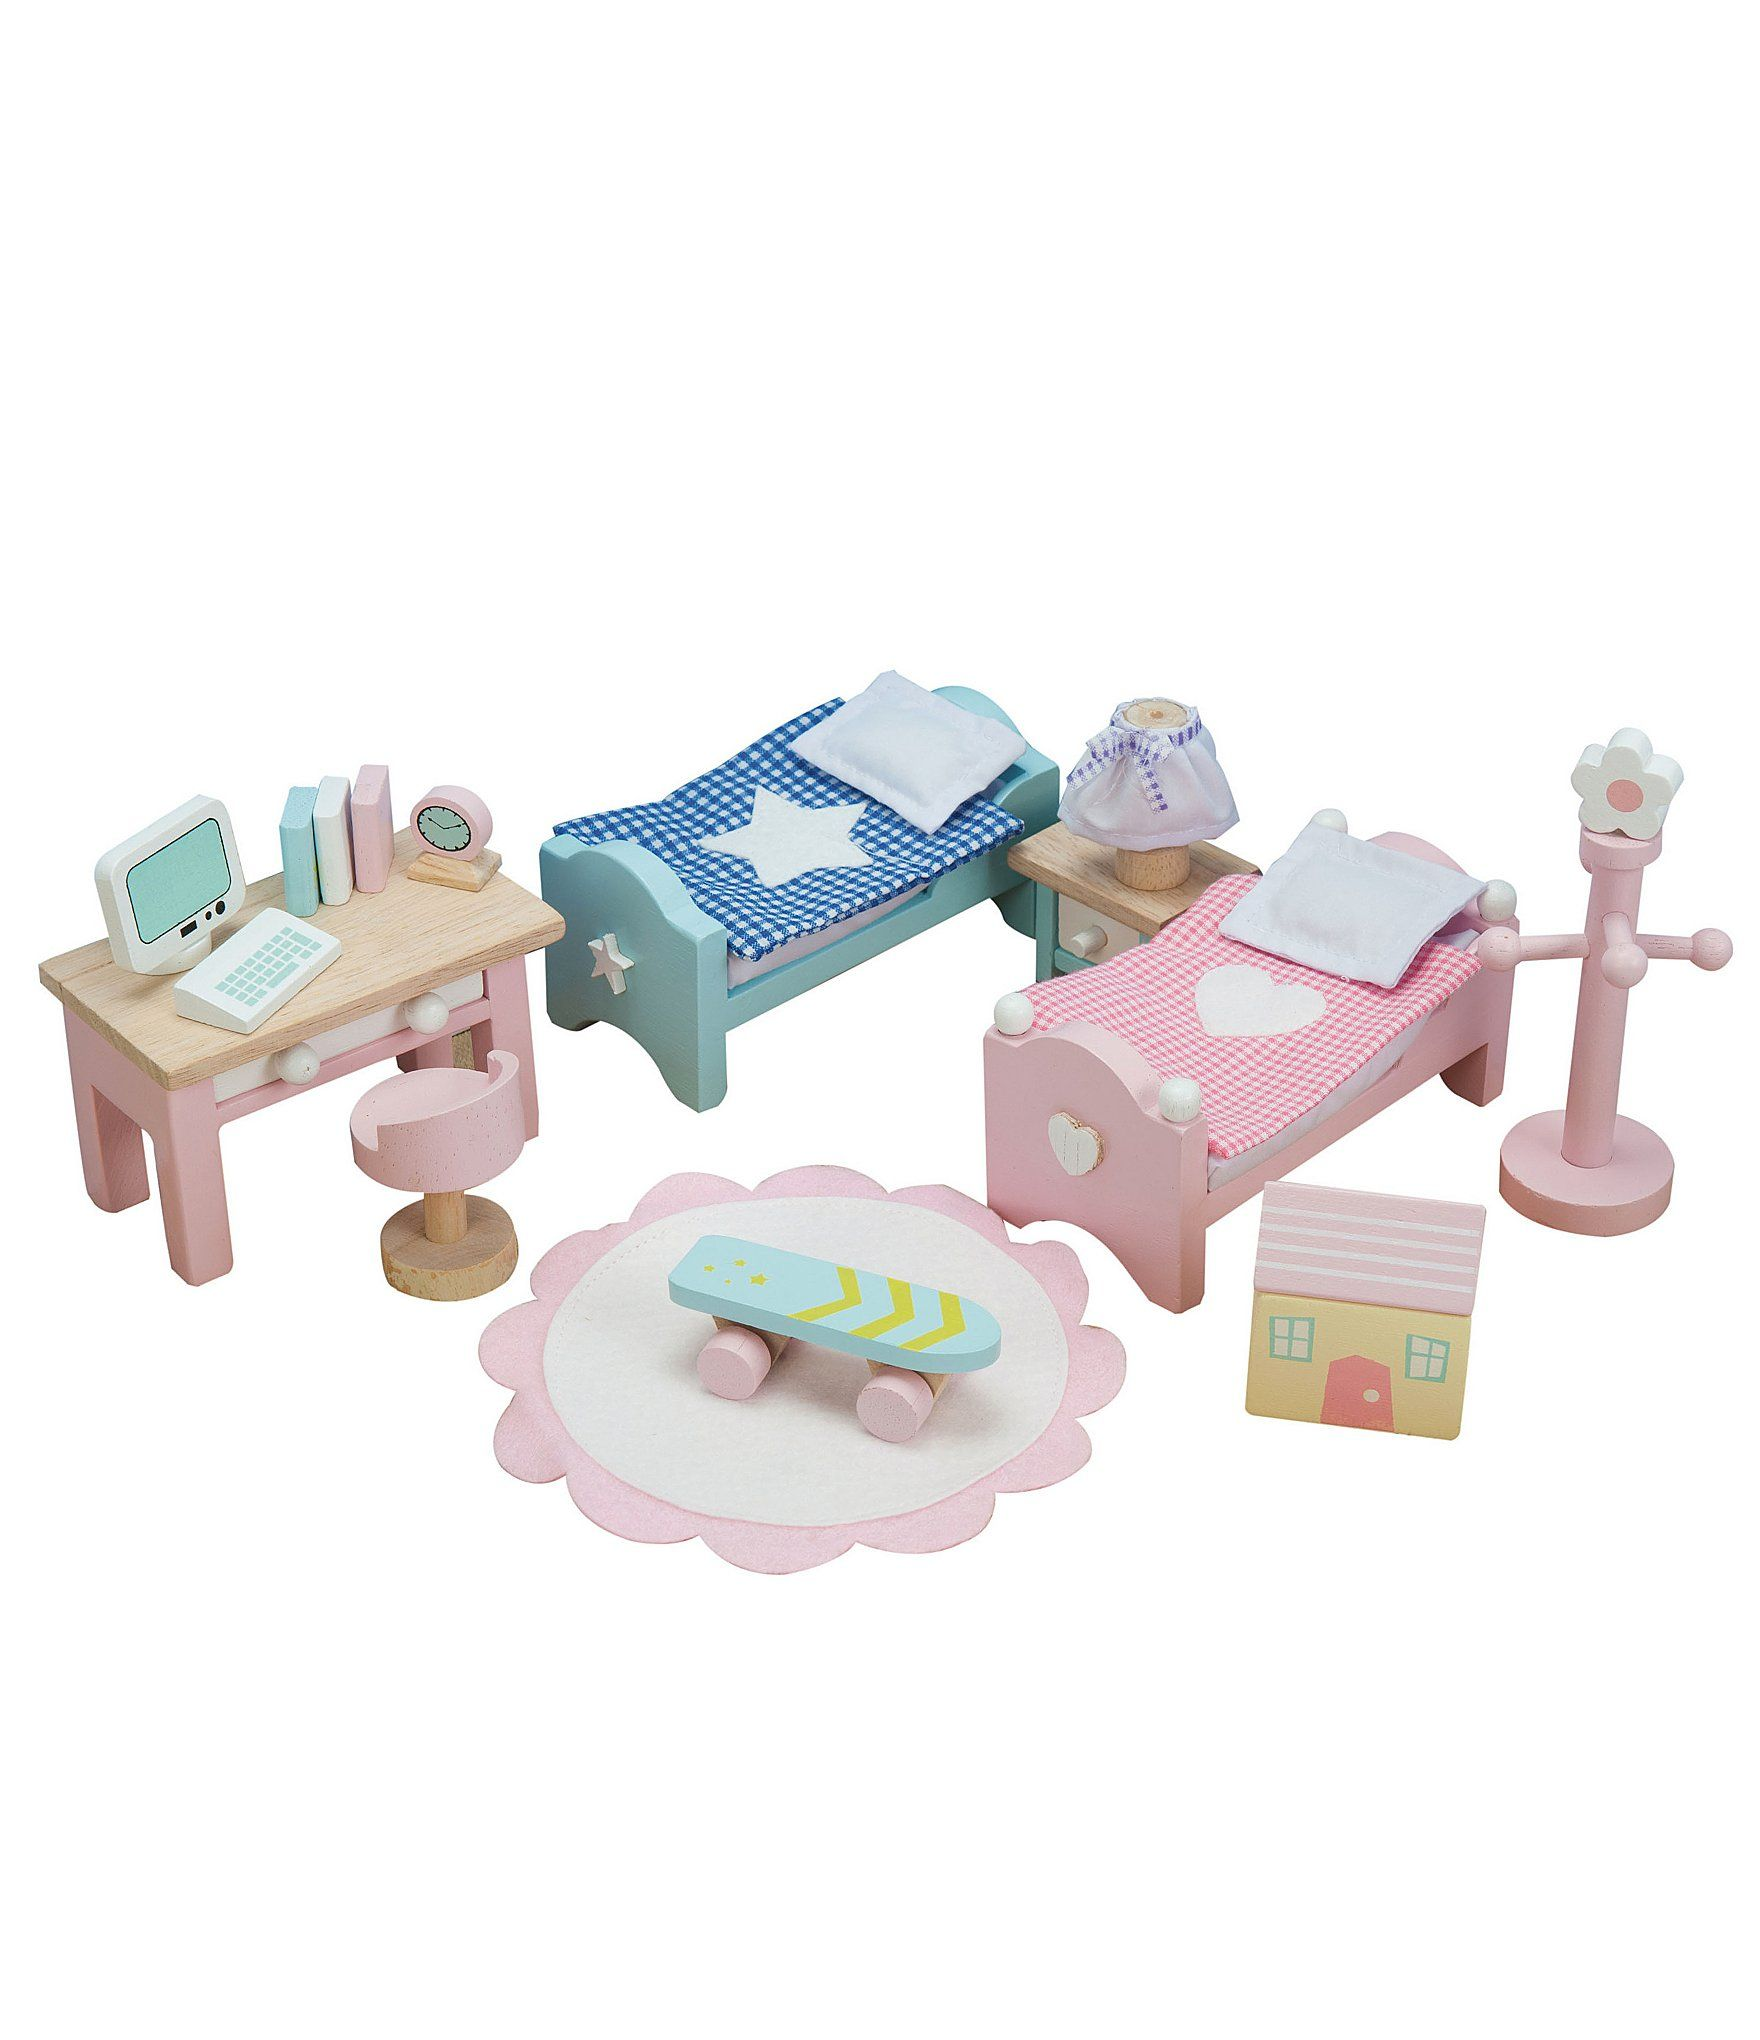 Le Toy Van Honeybake Daisy Lane Children's Bedroom Furniture Set | Dillard's